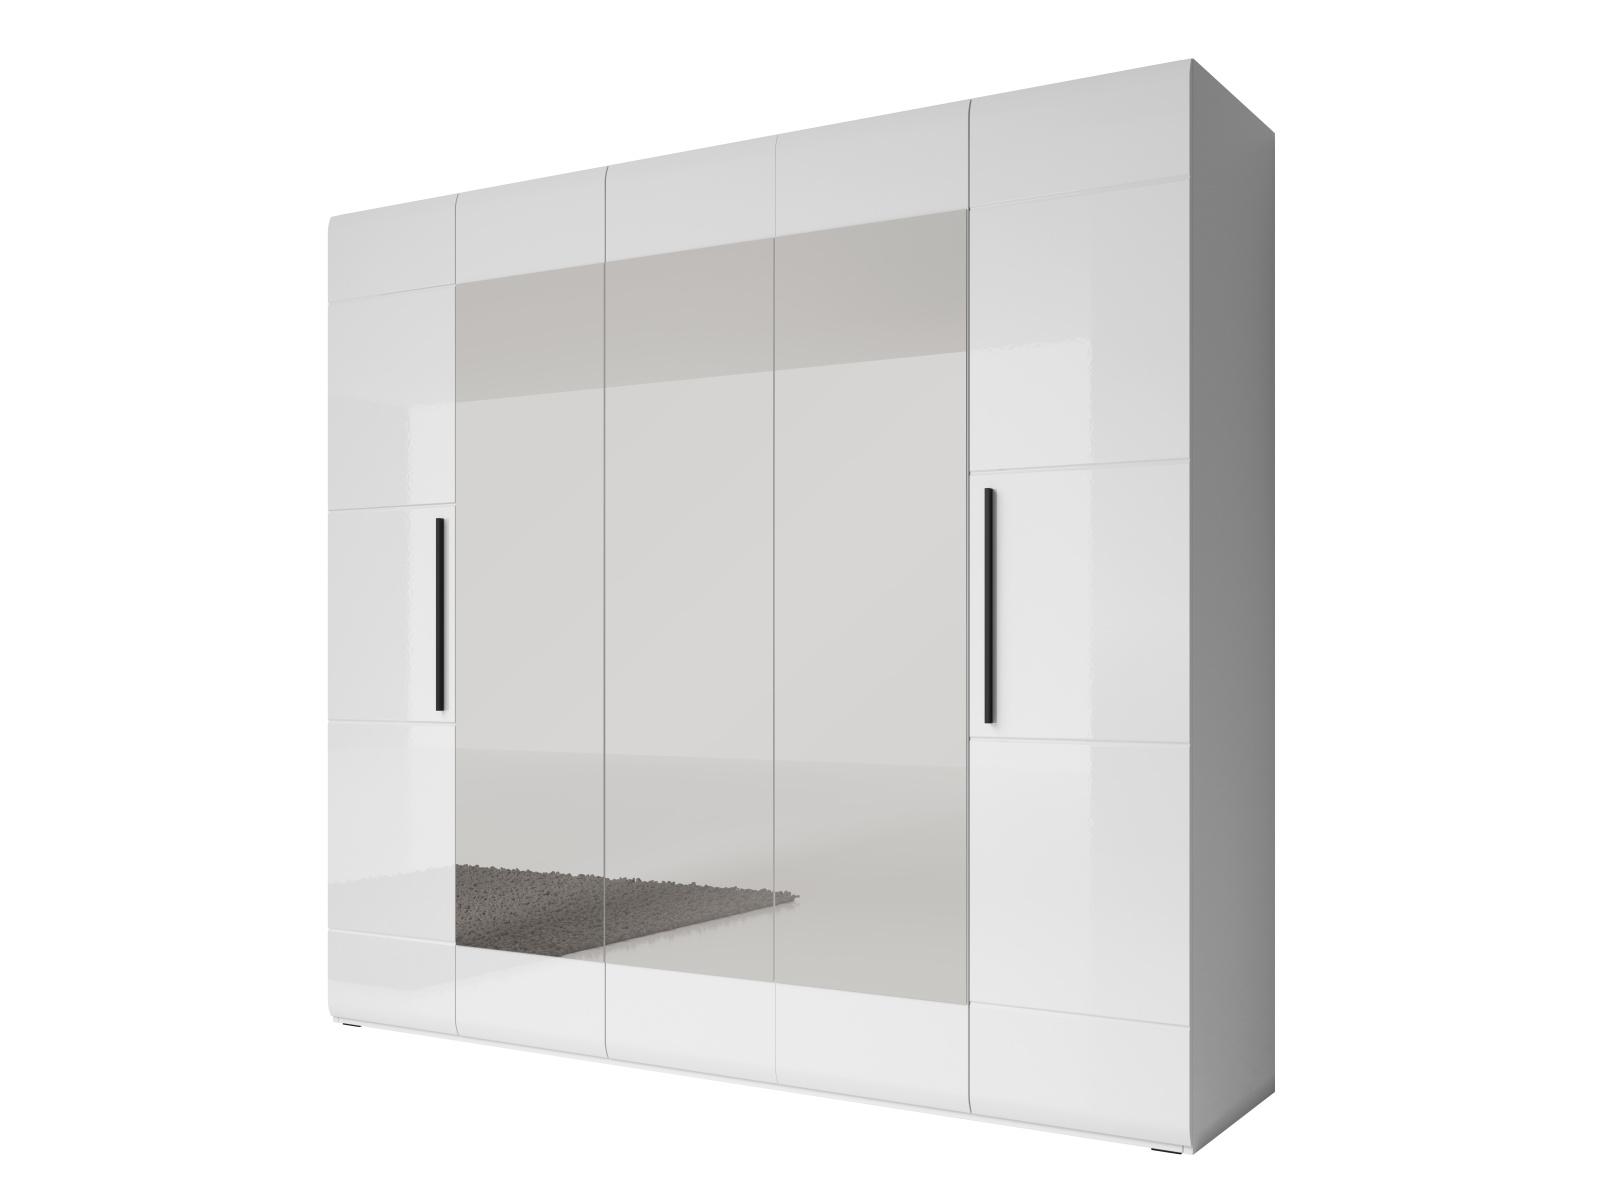 Smartshop HARMONY šatní skříň se zrcadlem 225 TYP 21, bílá/bílý lesk